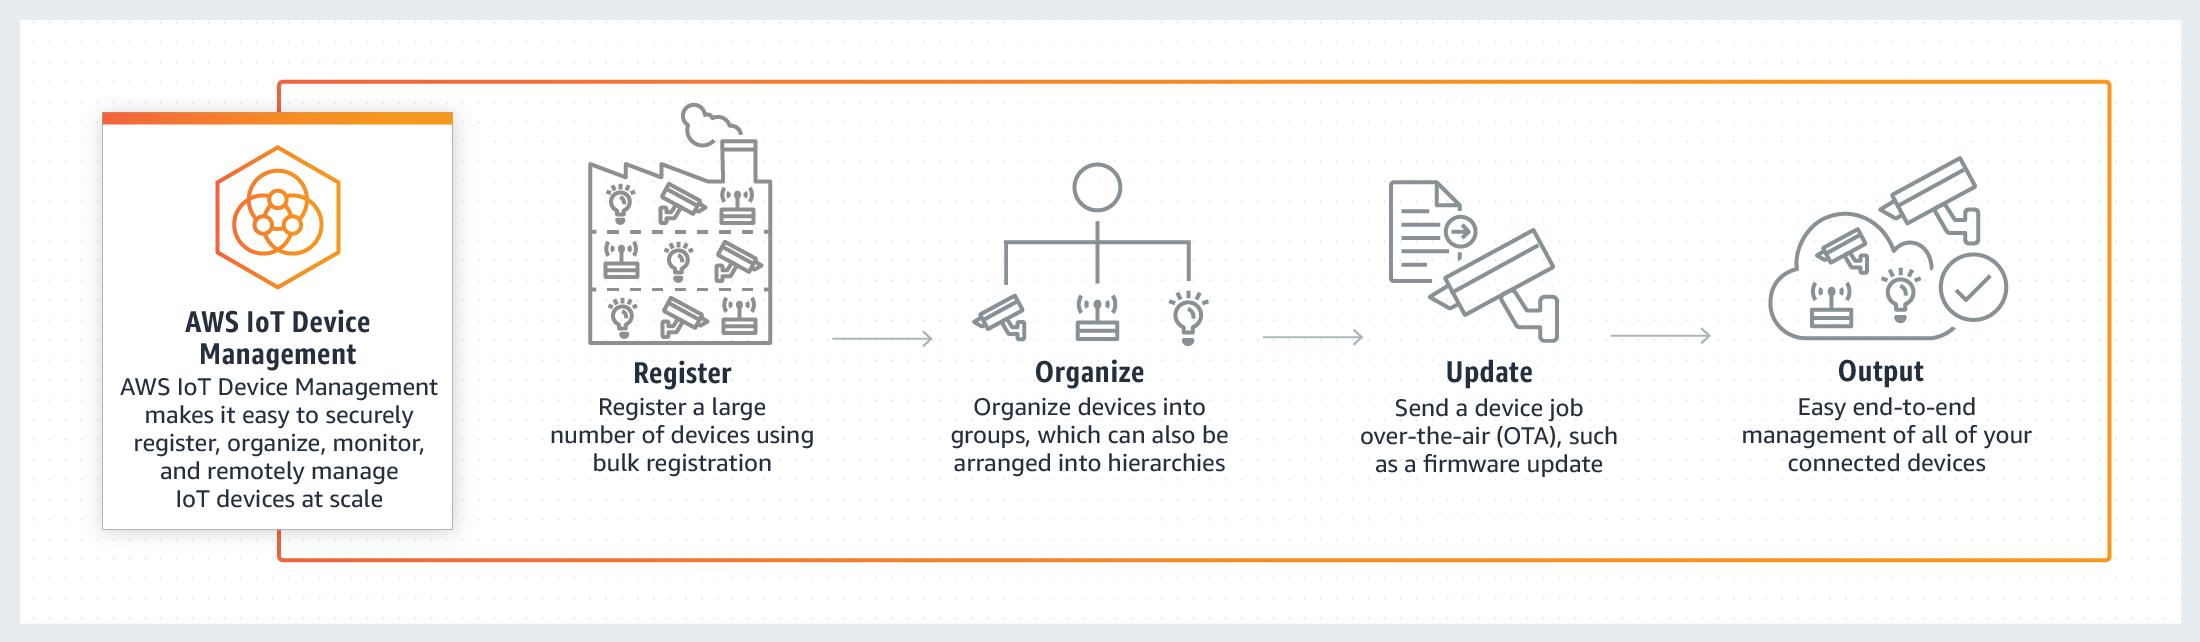 AWS IoT Platform